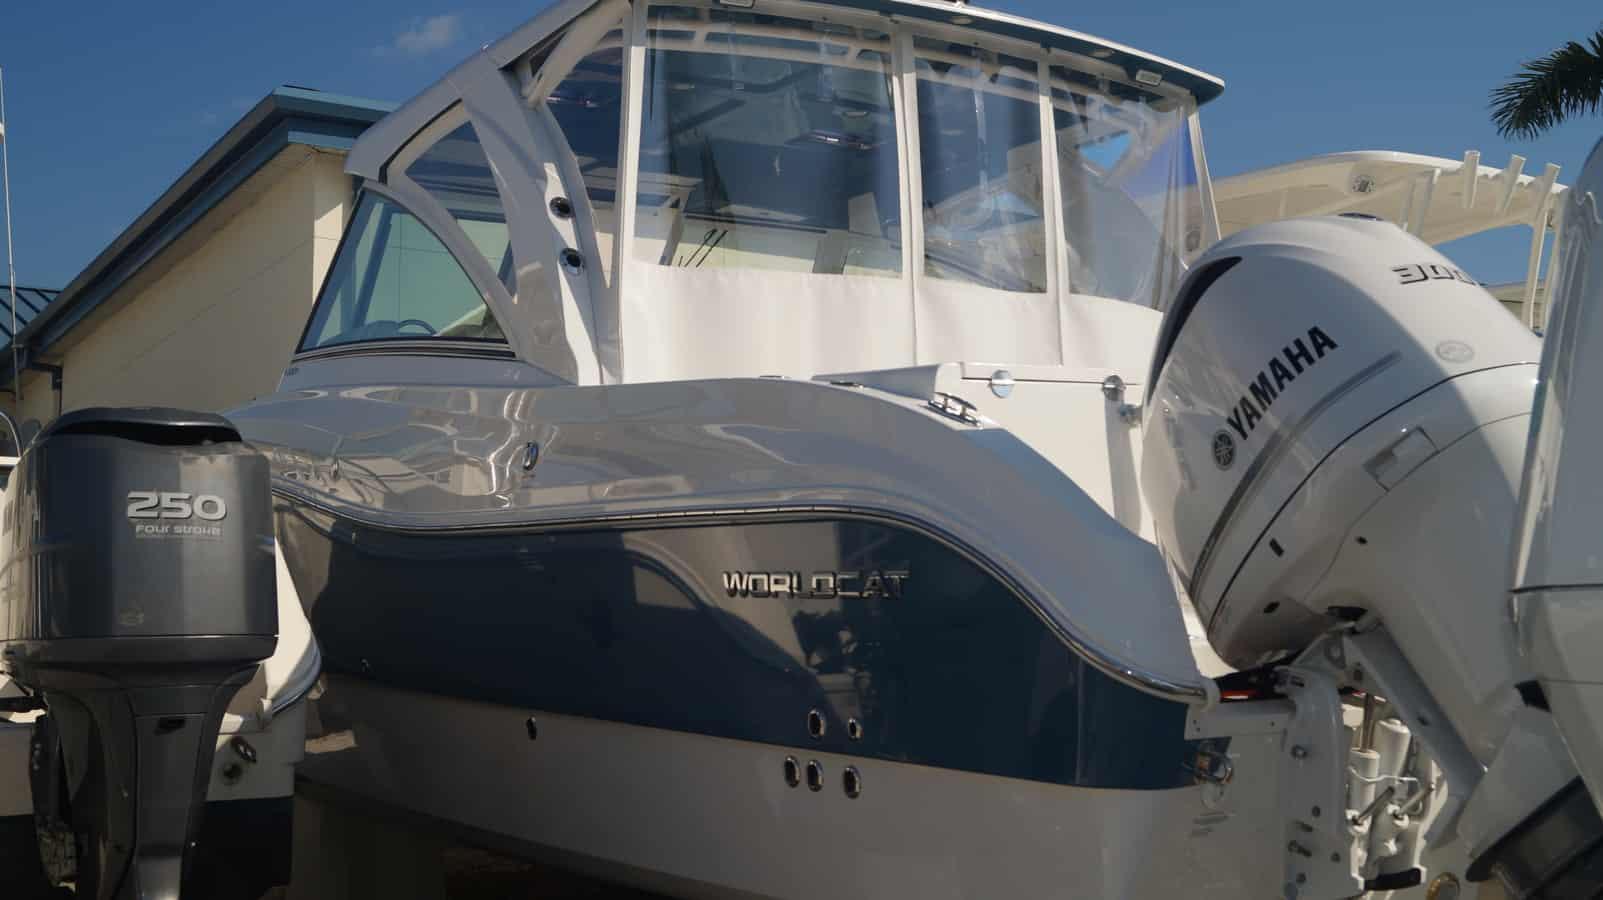 NEW 2019 World Cat 320DC Dual Console - Sara Bay Marina